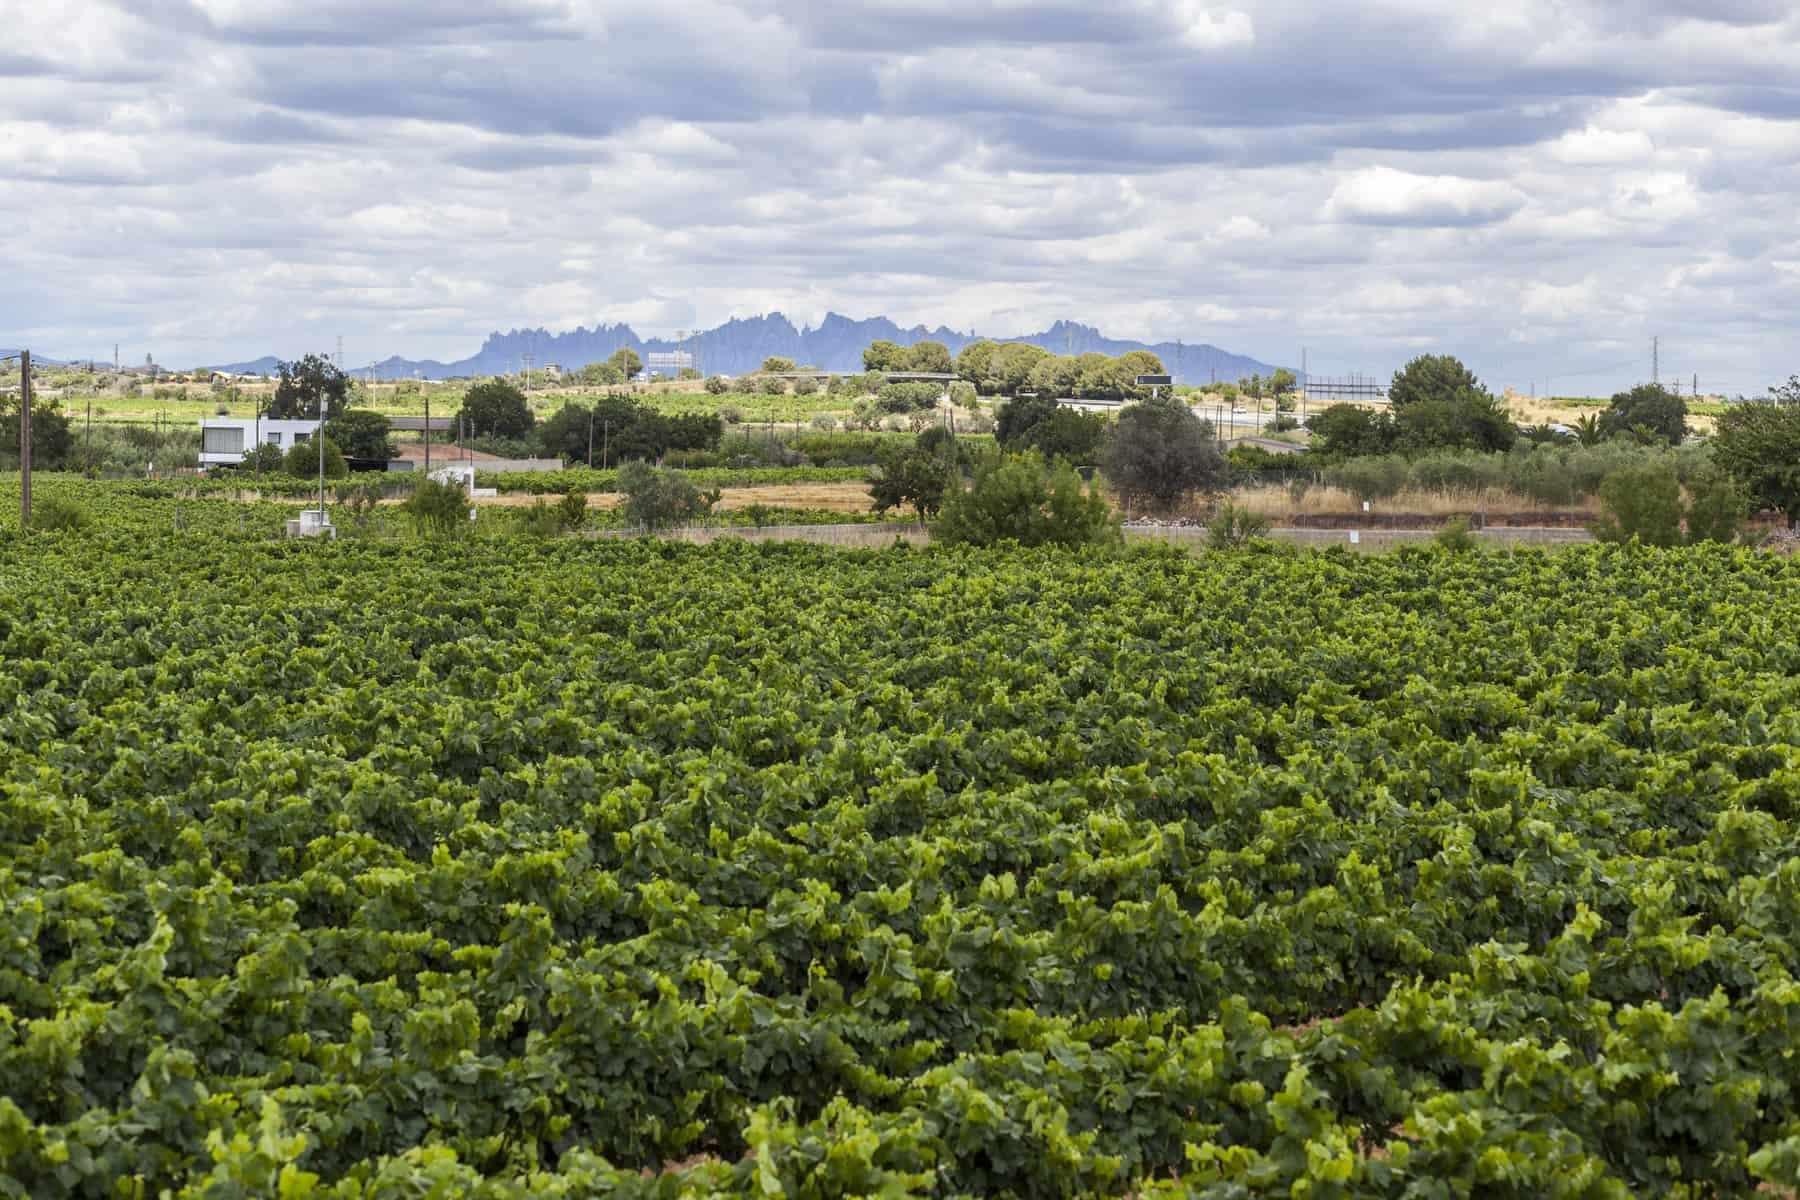 Penedes vin cava region, i baggrunden Montserrat bjergene. Vilafranca del Penedes, Catalonien, Spanien.